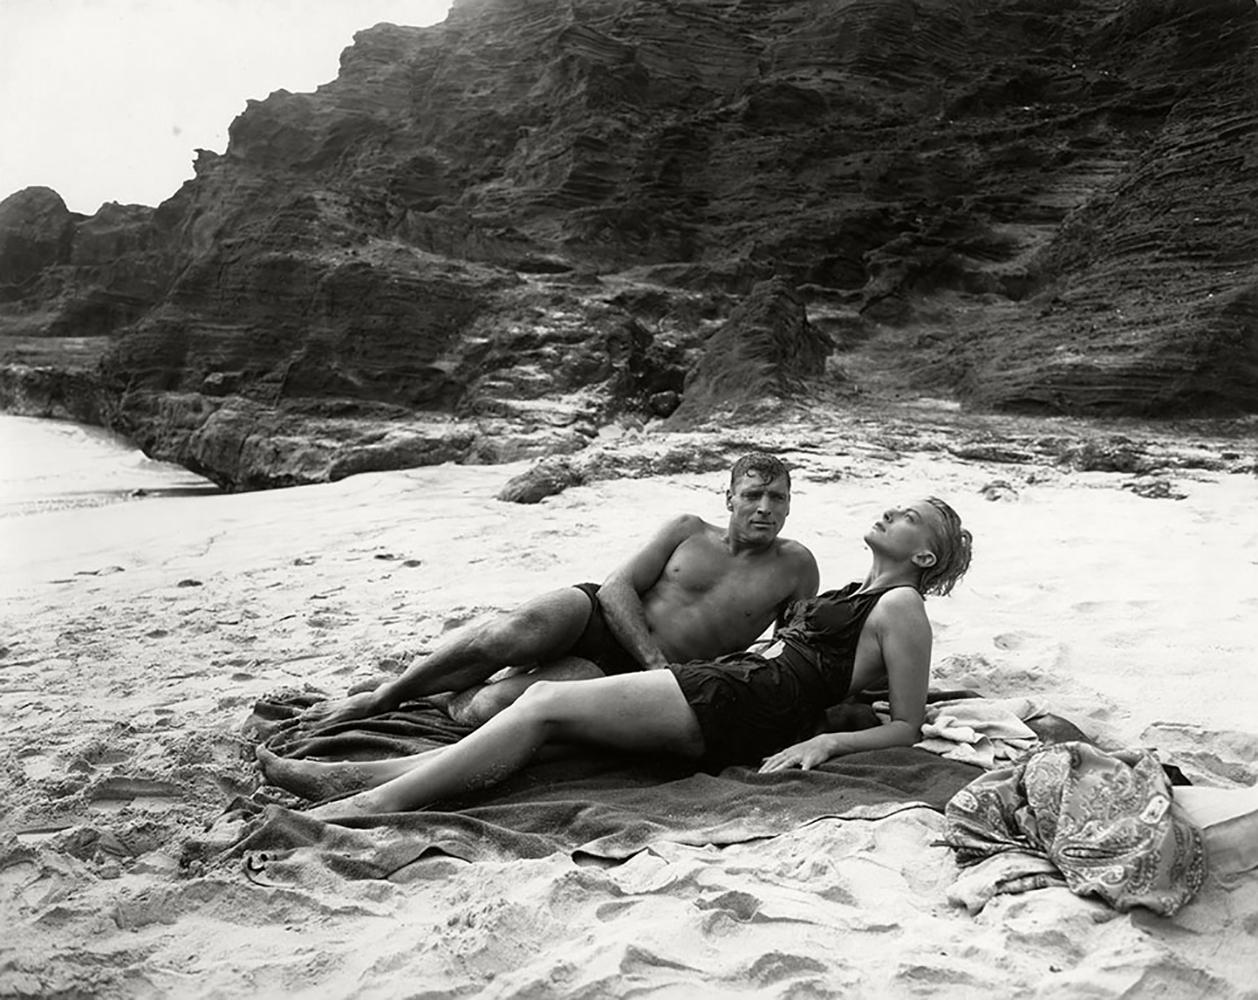 1953-From-Here-to-Eternity-Burt-Lancaster-Deborah-Kerr-Irving-Lippman